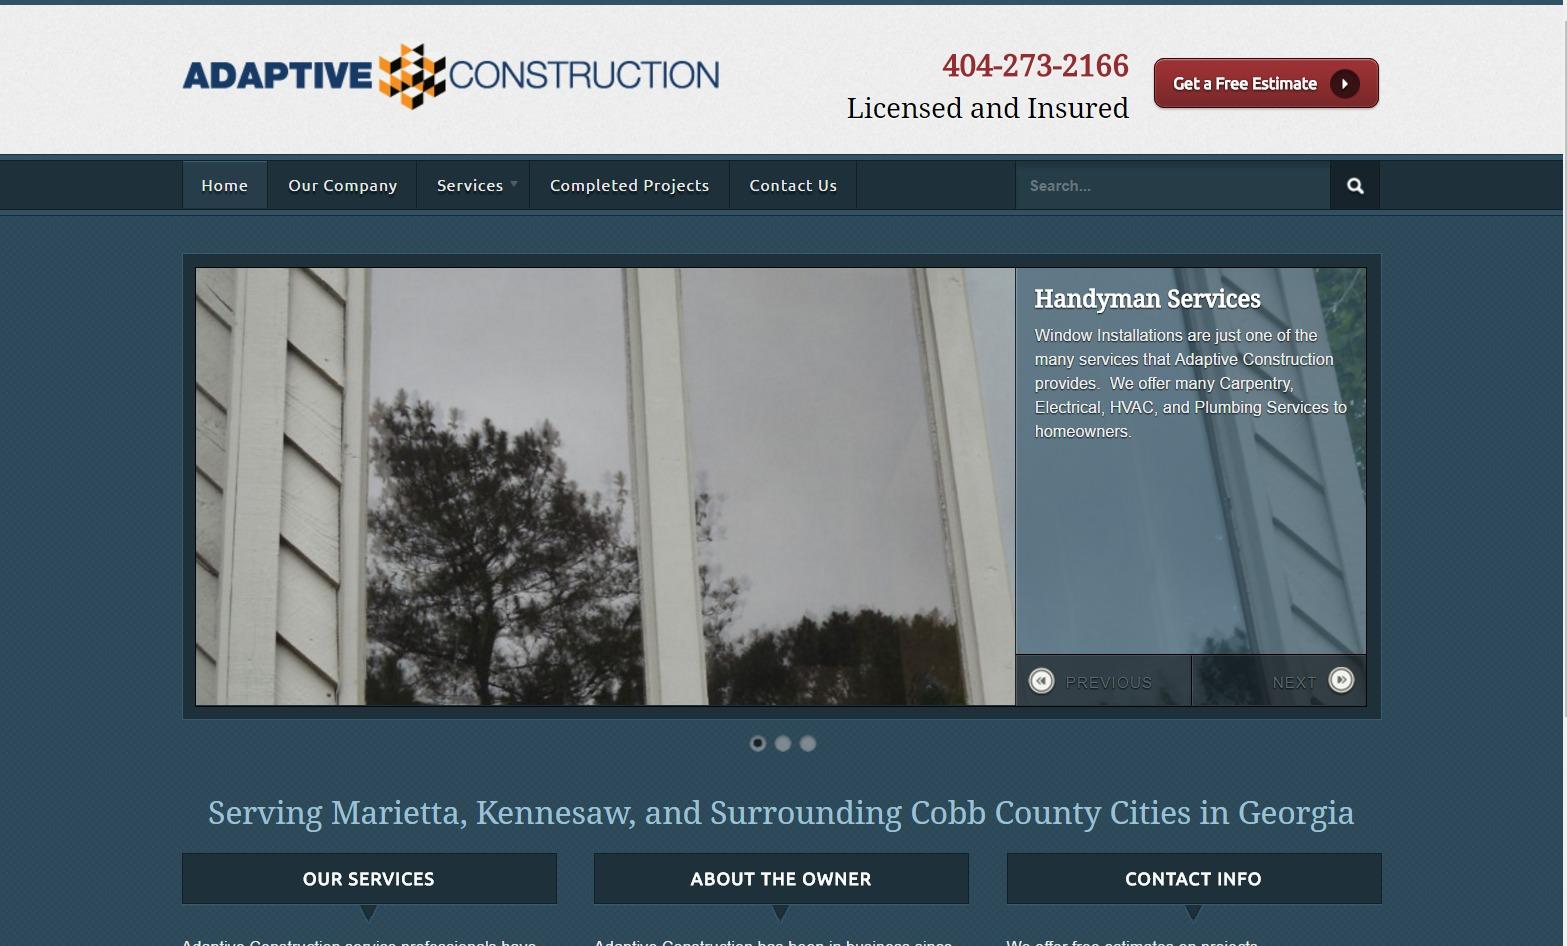 Adaptive Construction (Marietta, GA) Web Design Project